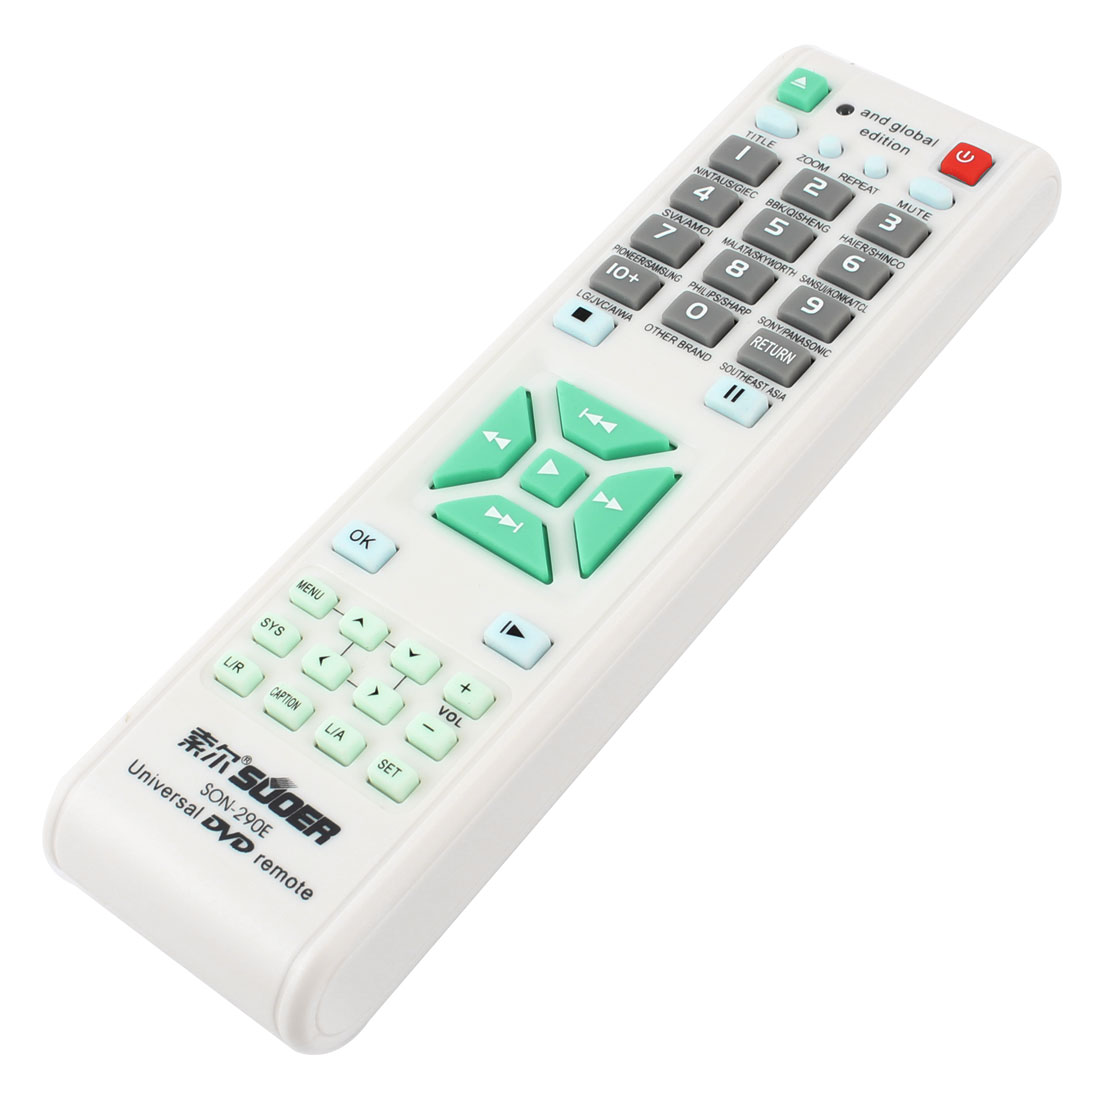 SON-290E Battery Power Universal DVD Remote Control White Gray